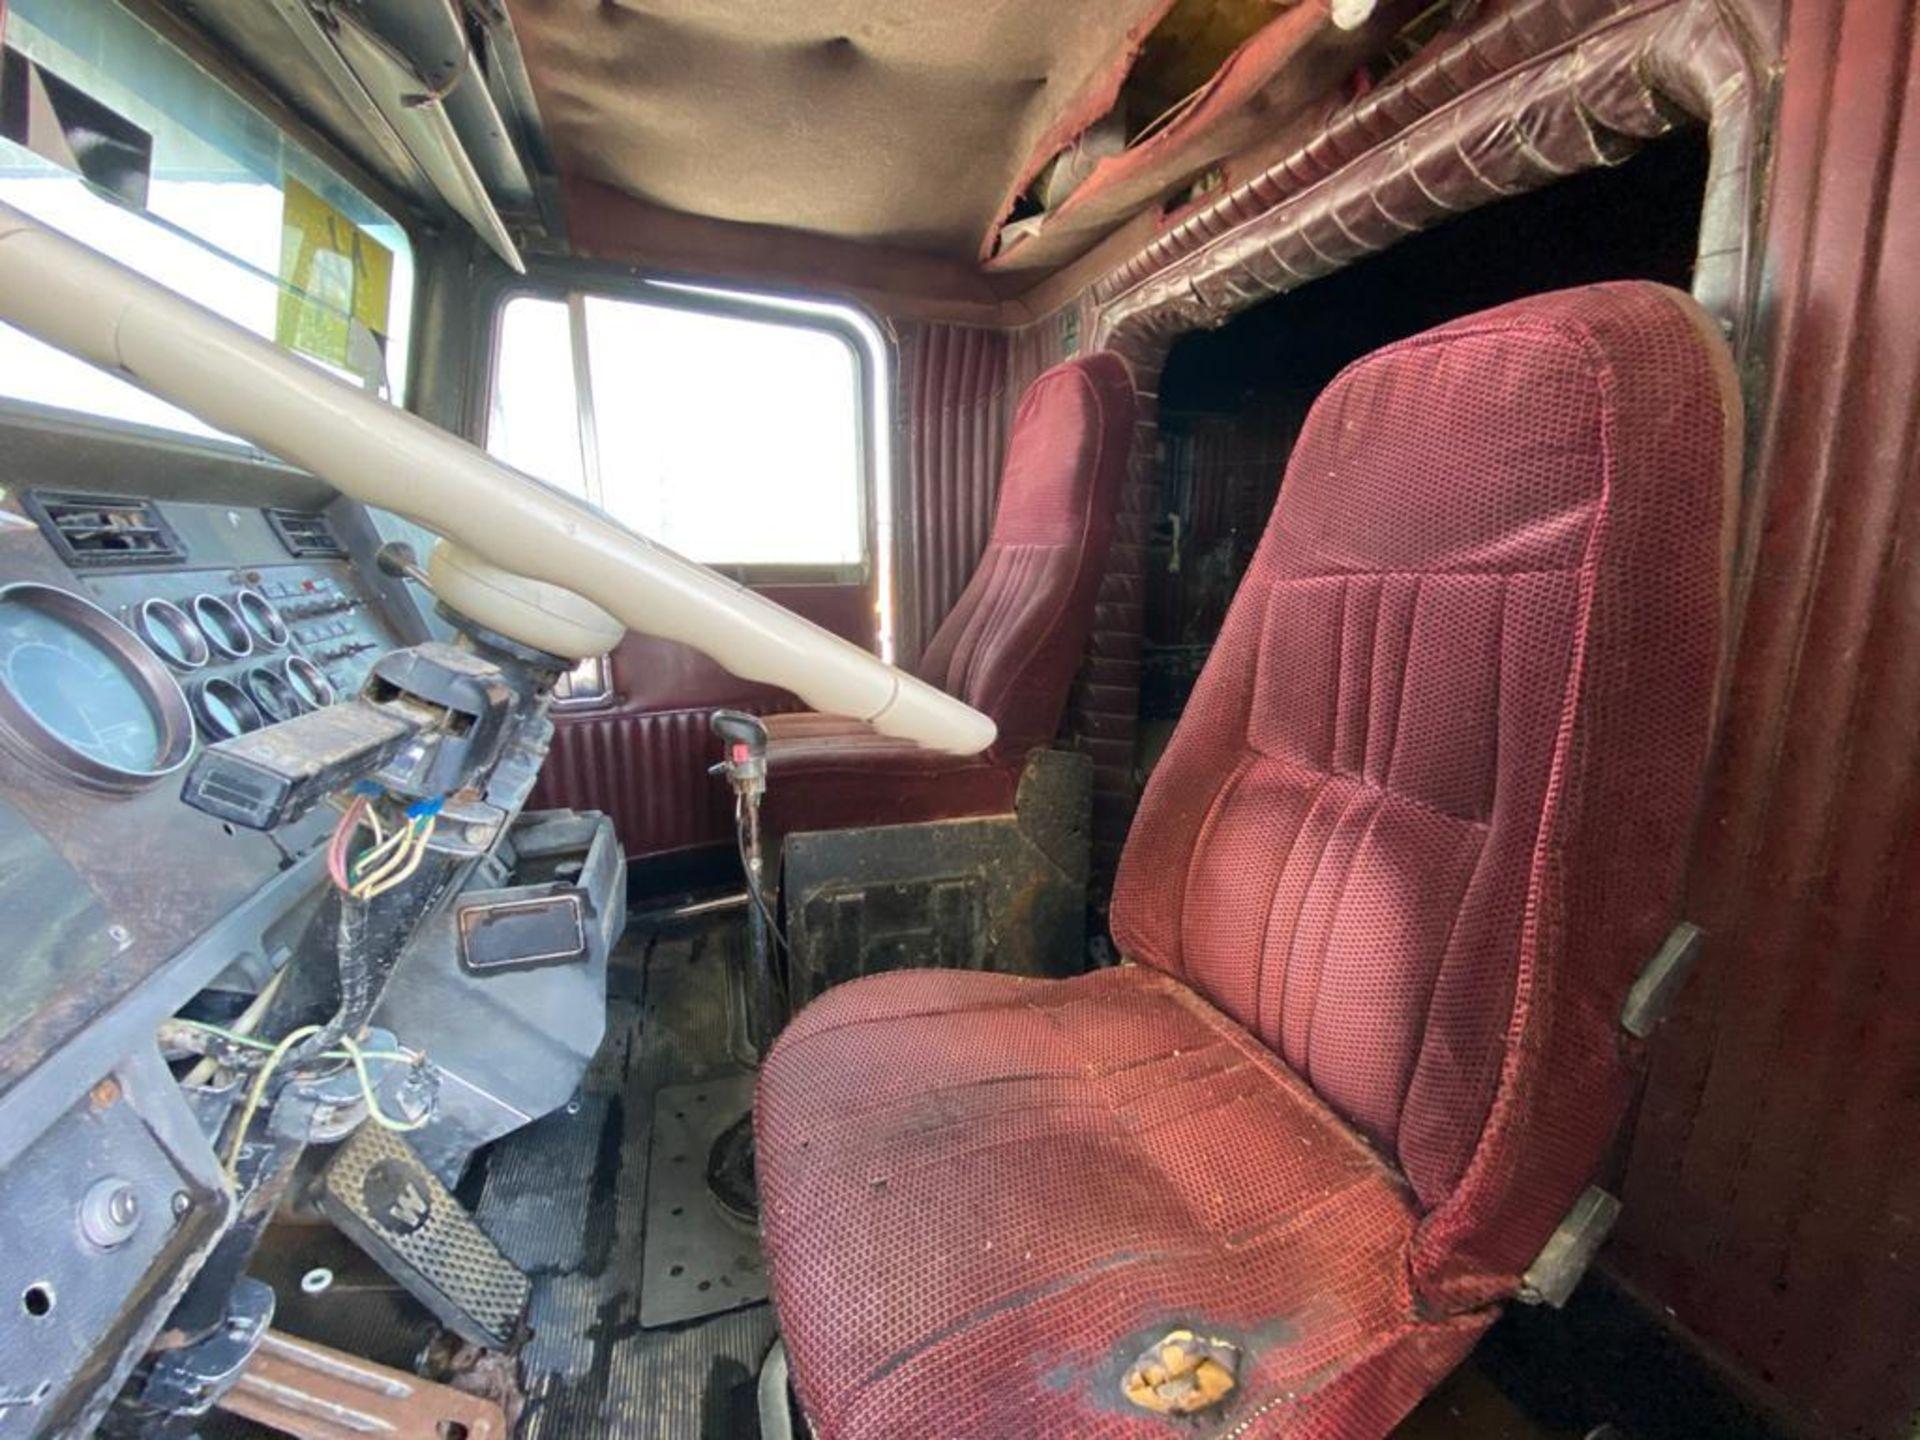 1983 Kenworth Dump Truck, standard transmission of 10 speeds, with Cummins motor - Image 32 of 68